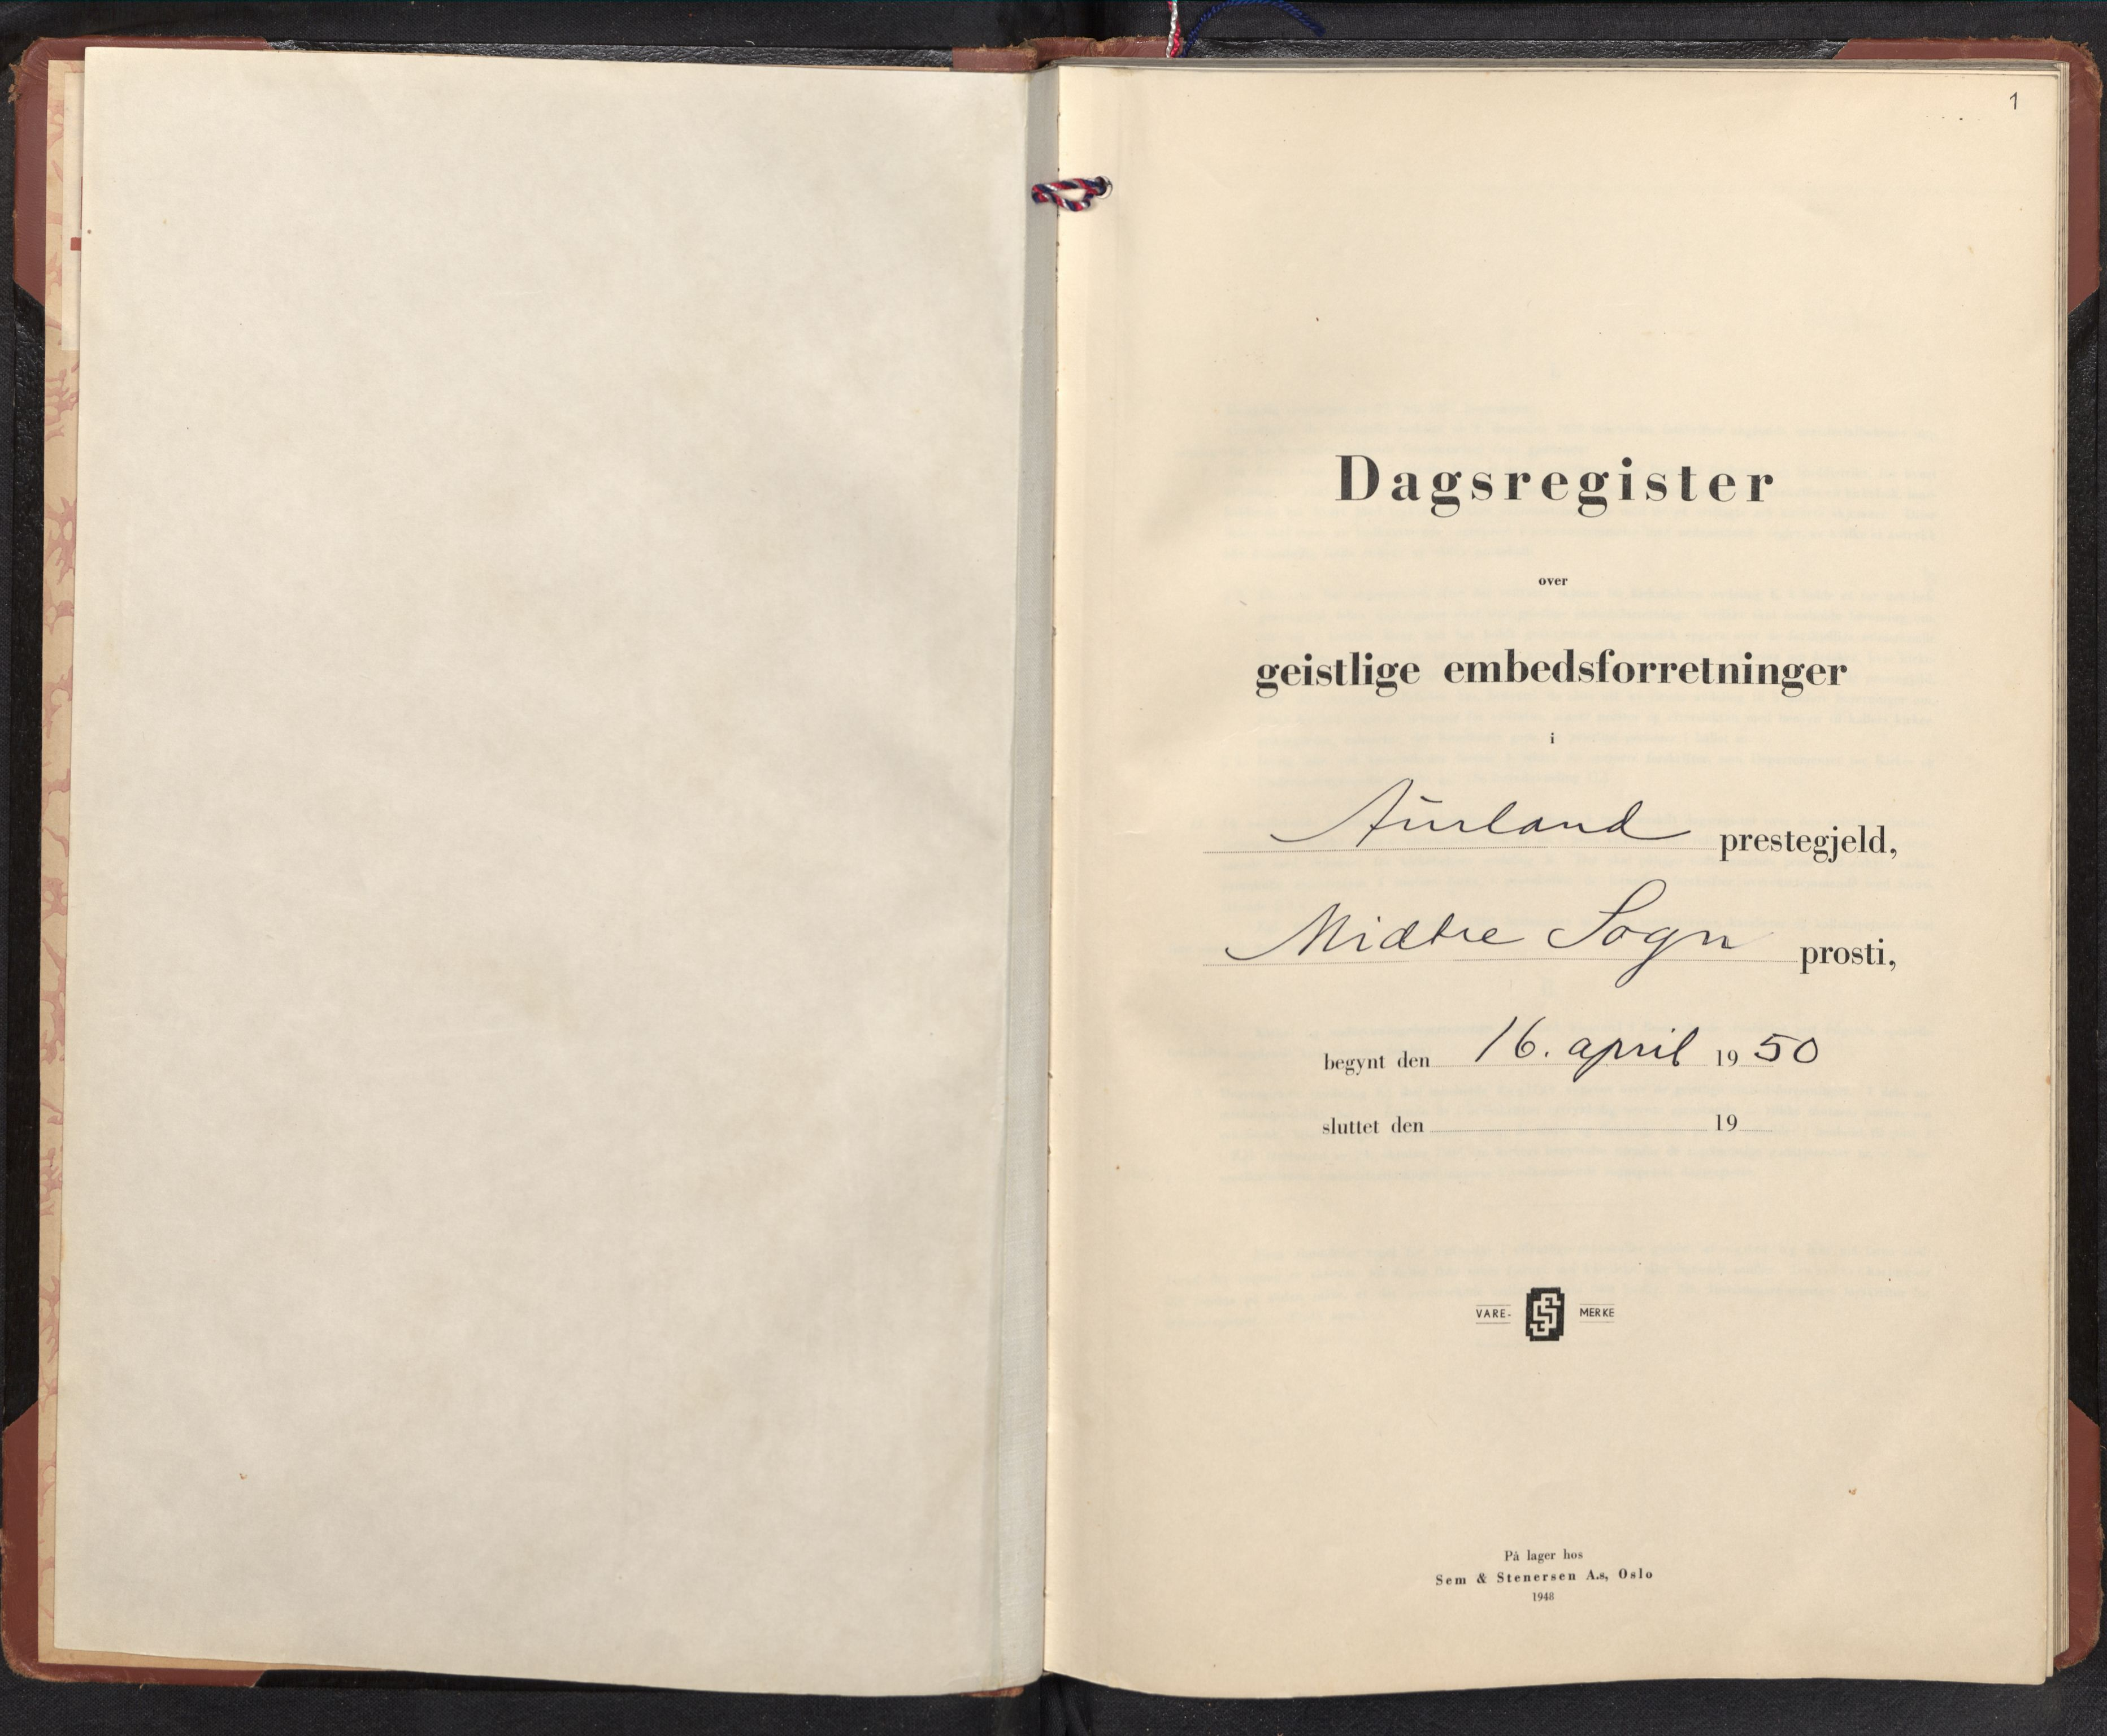 SAB, Aurland Sokneprestembete*, Dagregister nr. F 4, 1950-1965, s. 0b-1a